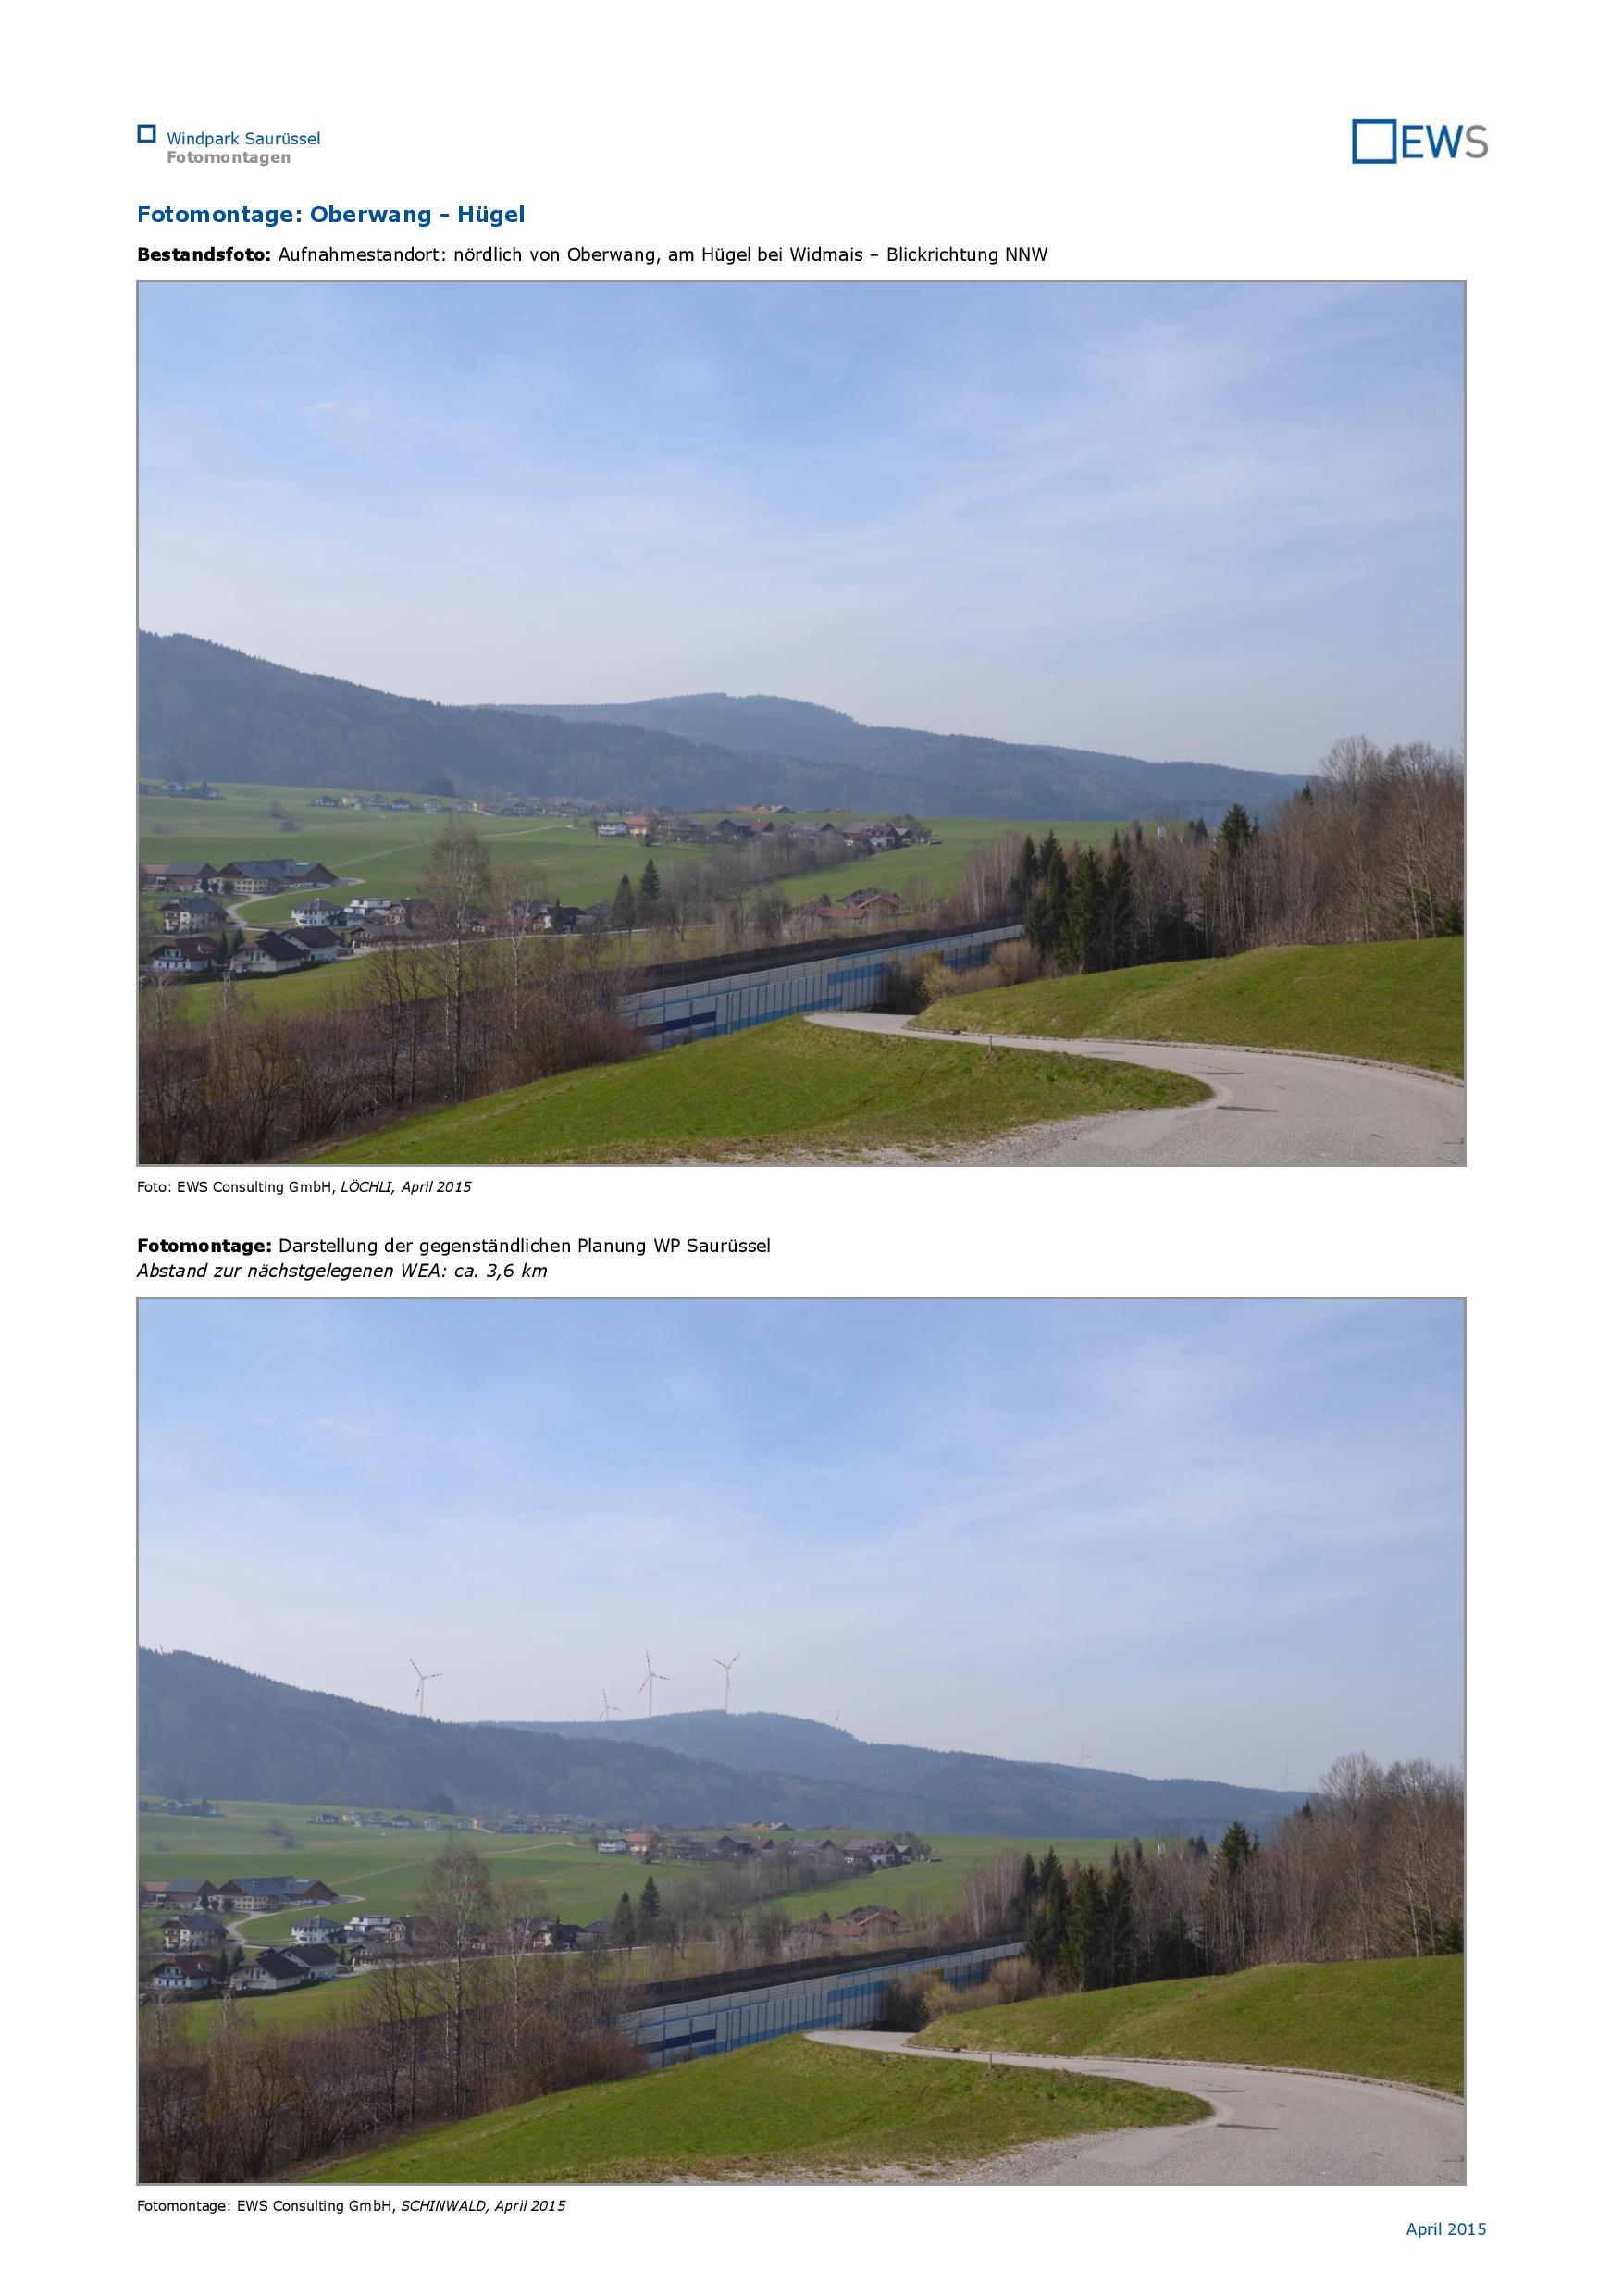 fm_oberwang_huegel_a3-page-001